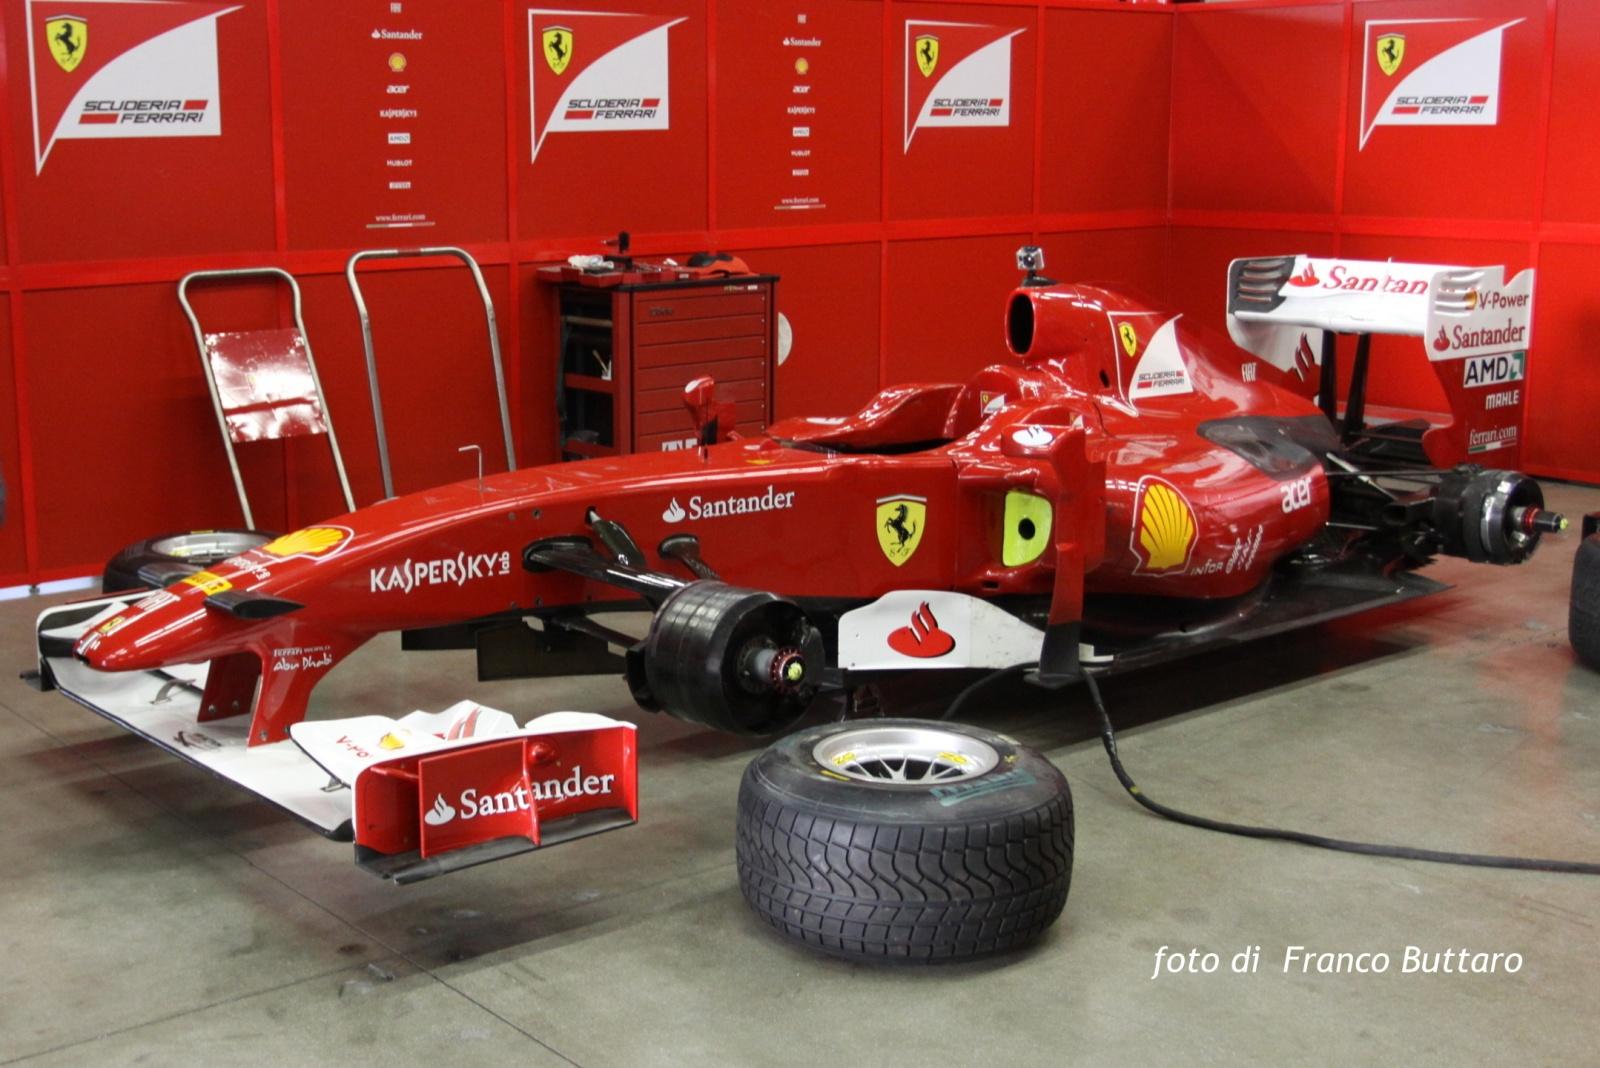 Motor Show 2012 - Ferrari day - Bologna, 7 dicembre 2012